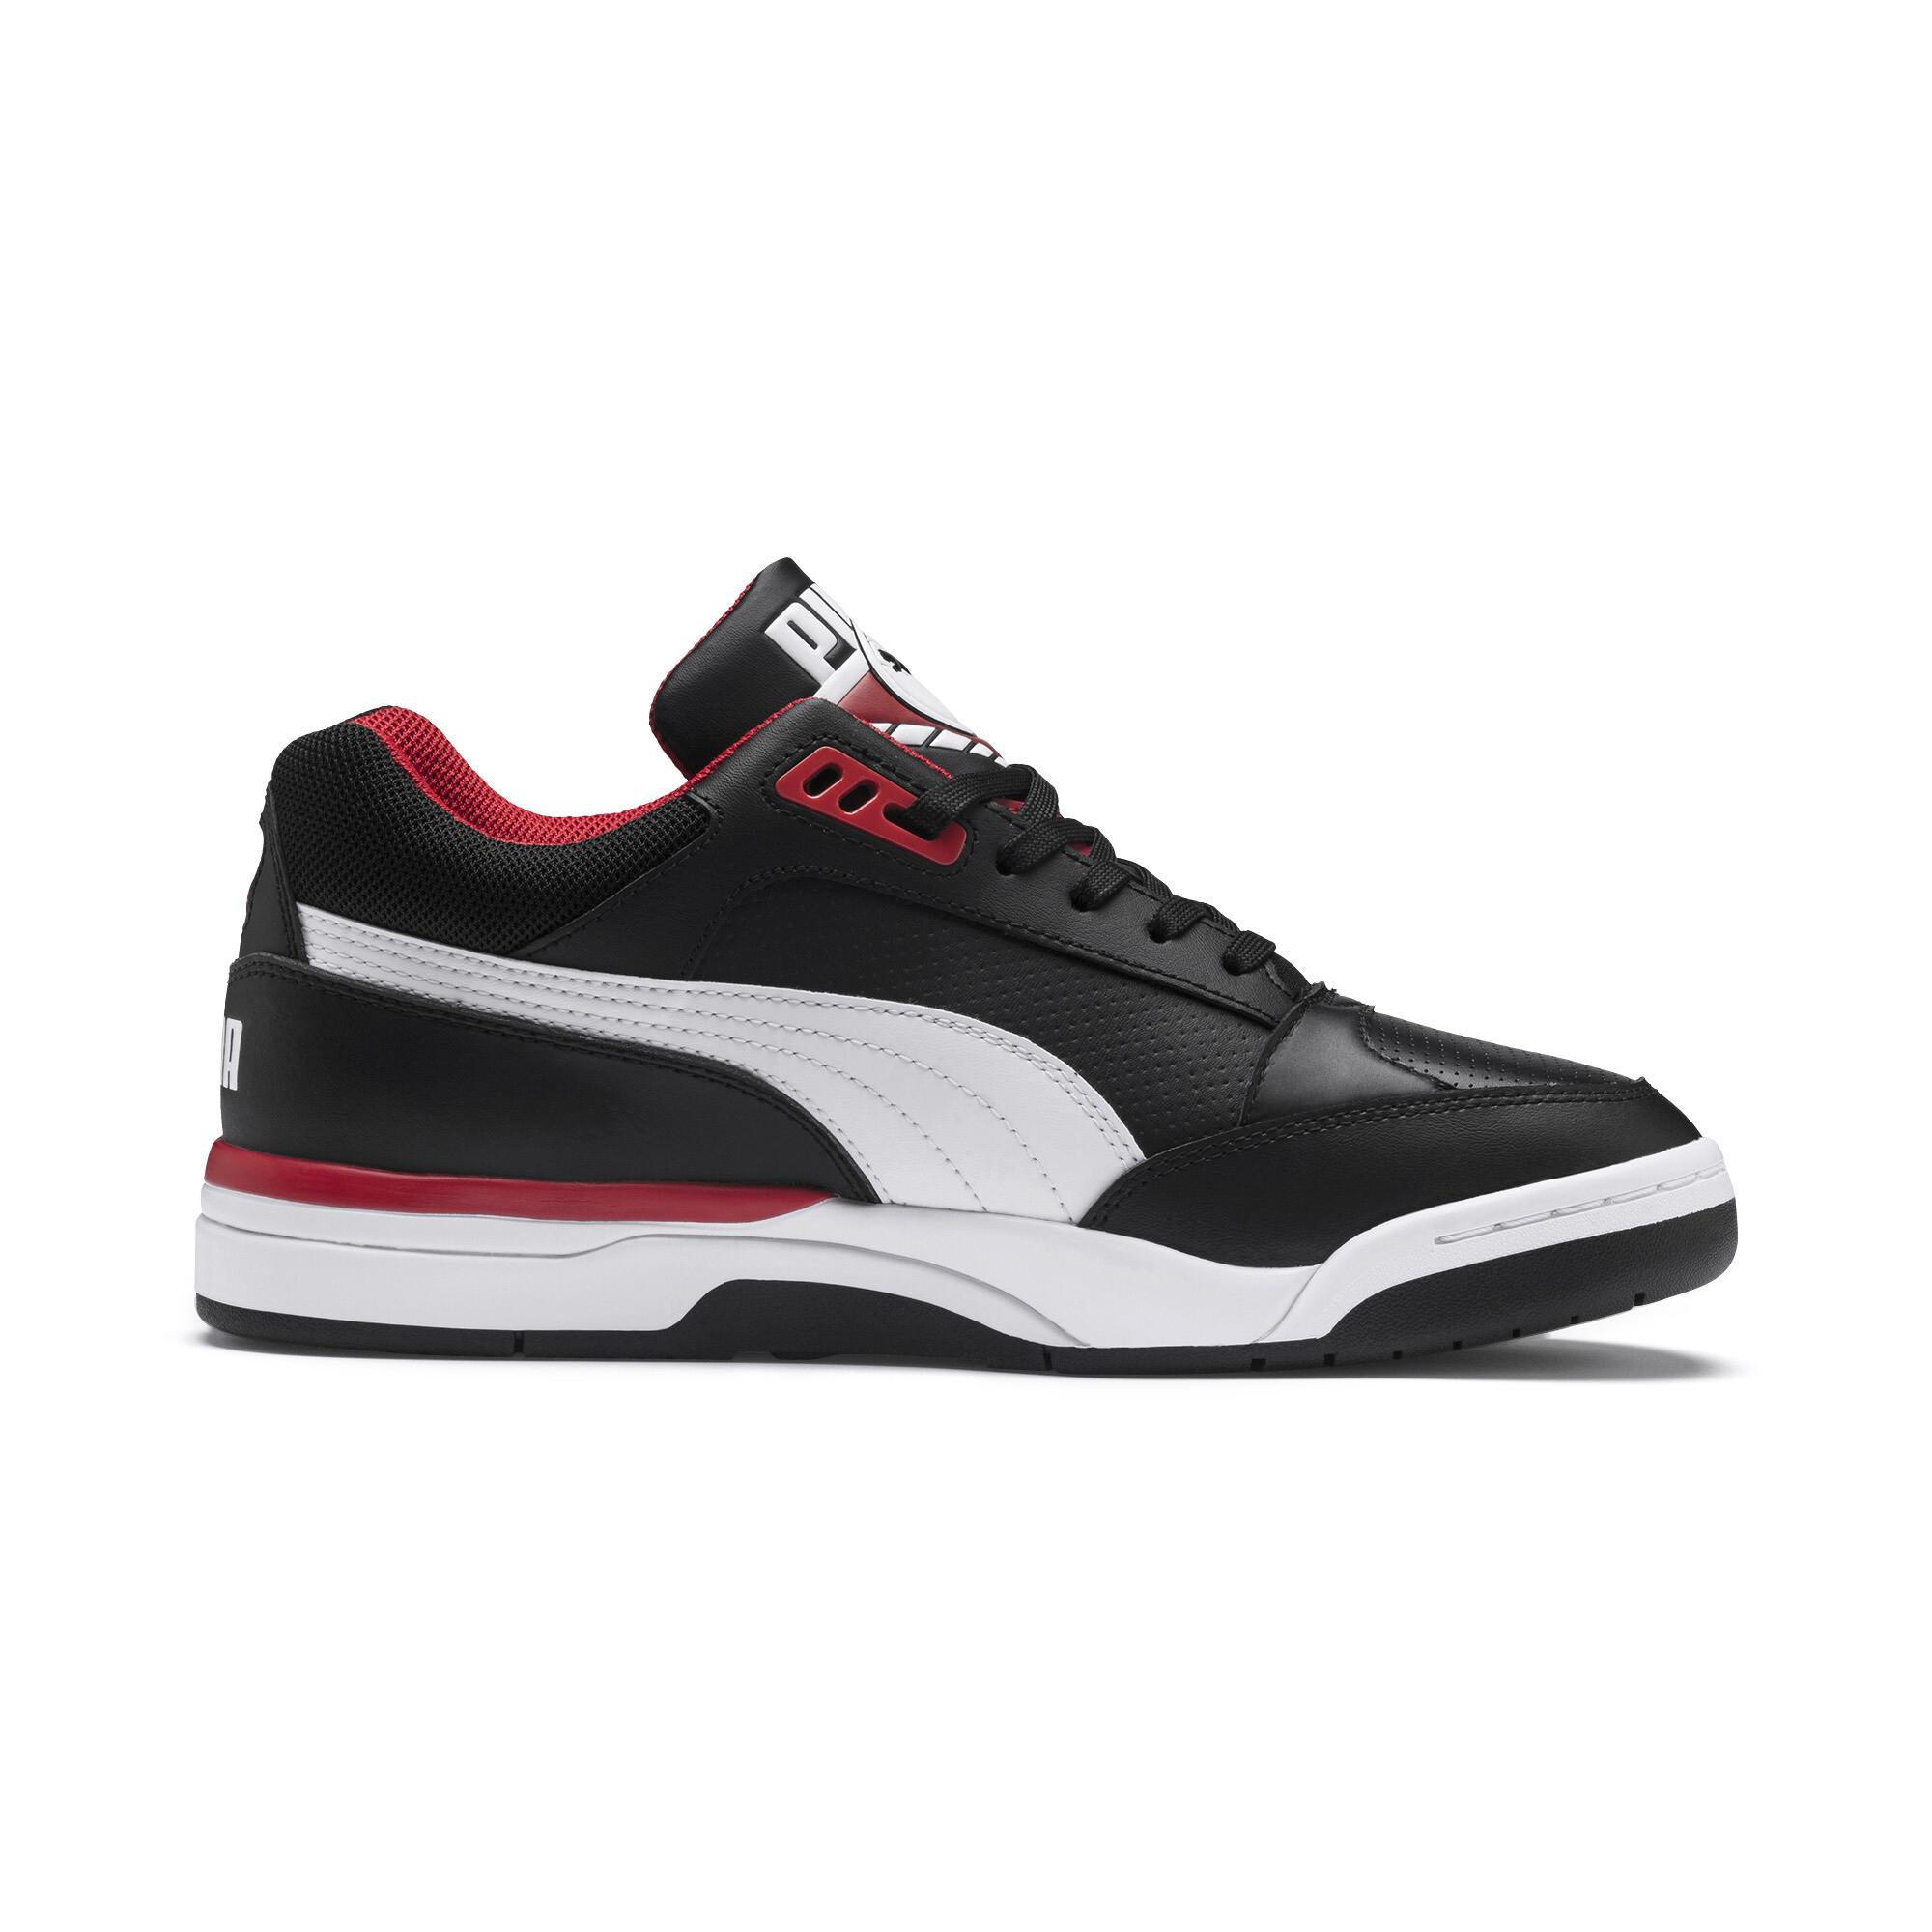 Indexbild 12 - PUMA Palace Guard Sneaker Unisex Schuhe Sport Classics Neu